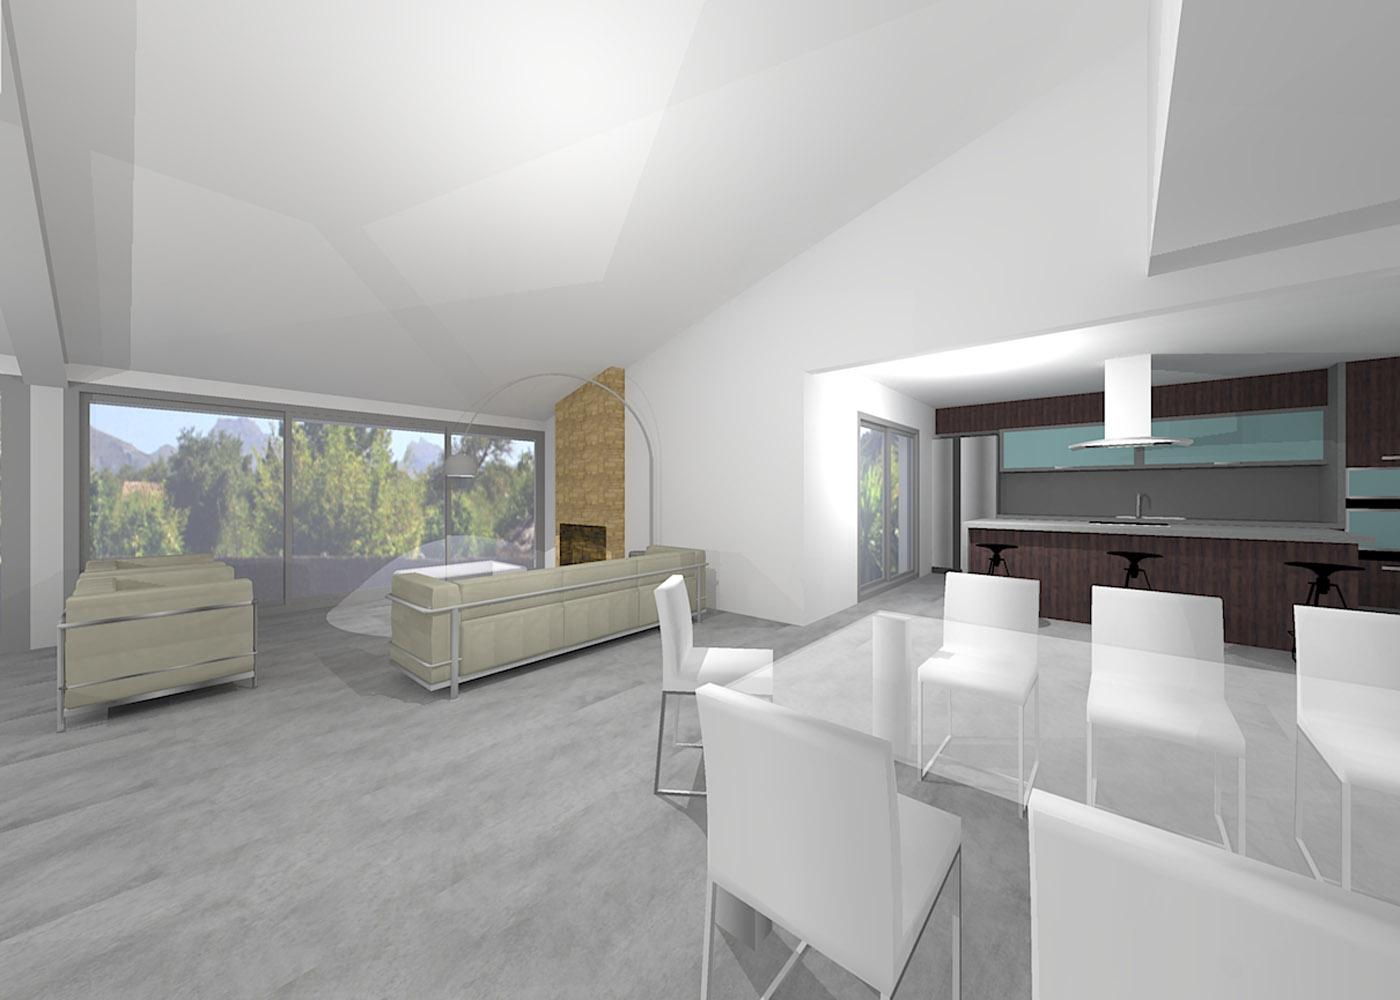 single-family-detached-house-rehabilitation-sant-pere-de-ribes-barcelona-05